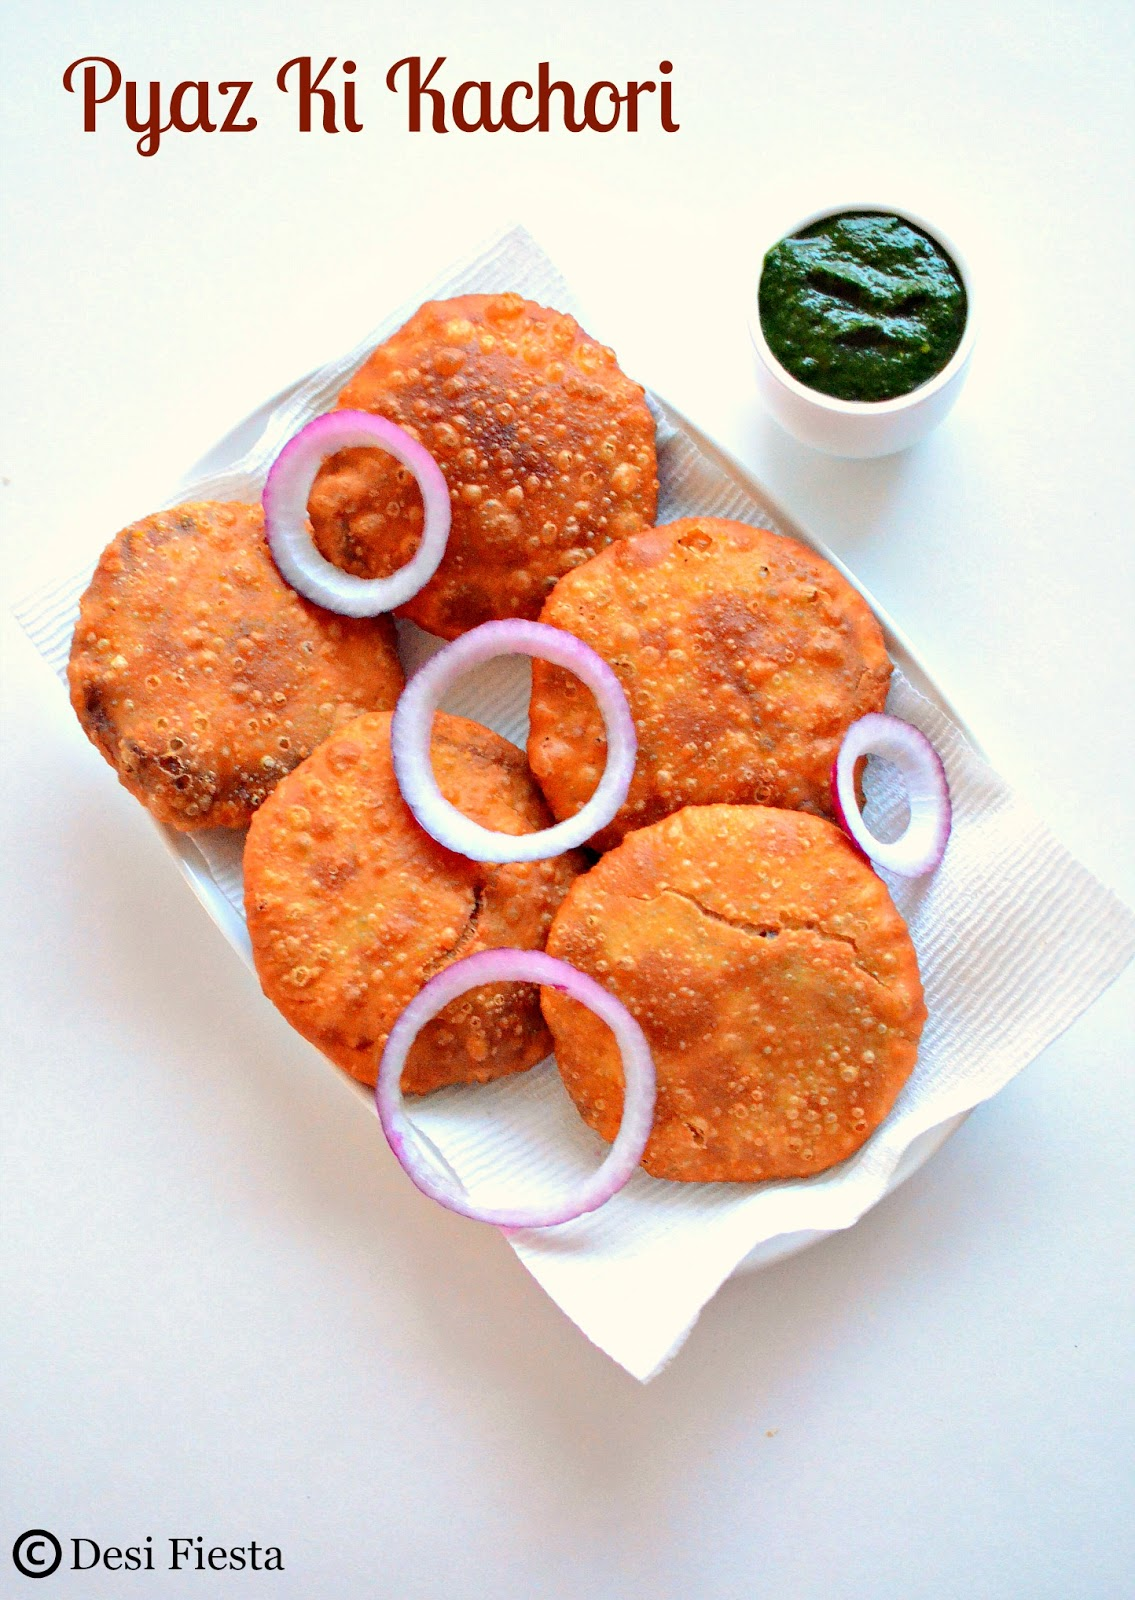 Jodhpuri Pyaz Ki Kachori